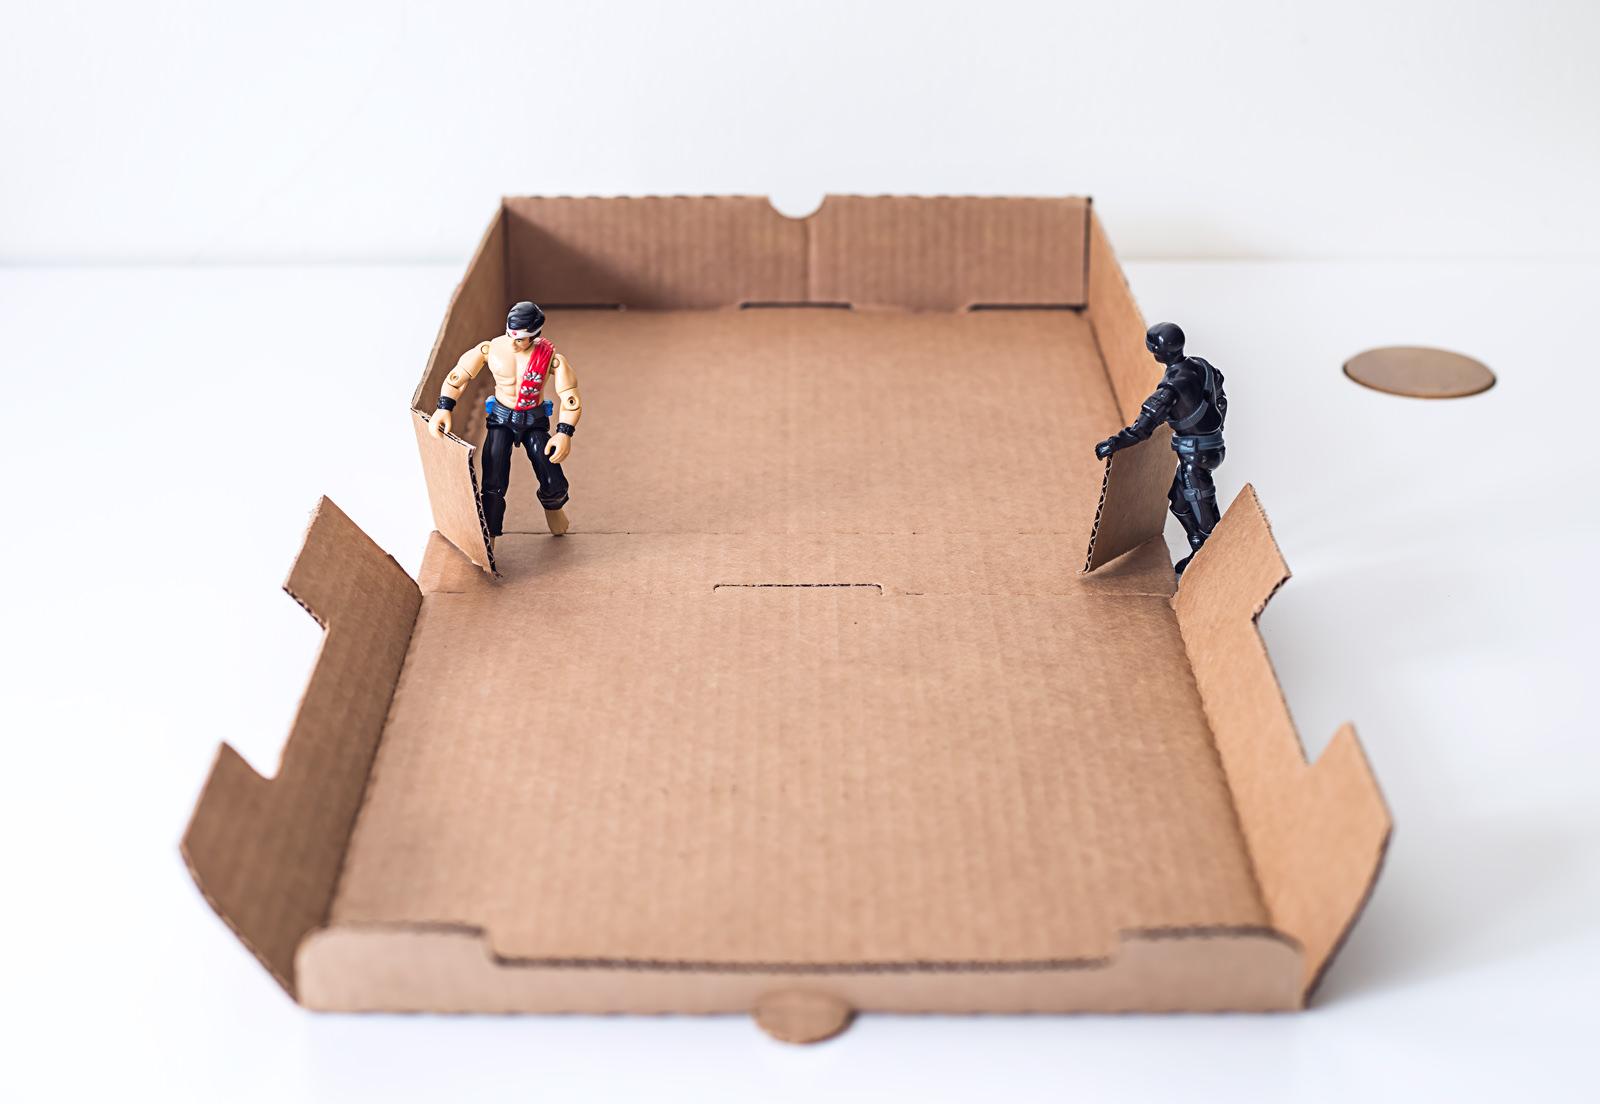 pizza-box-diorama-3.jpg